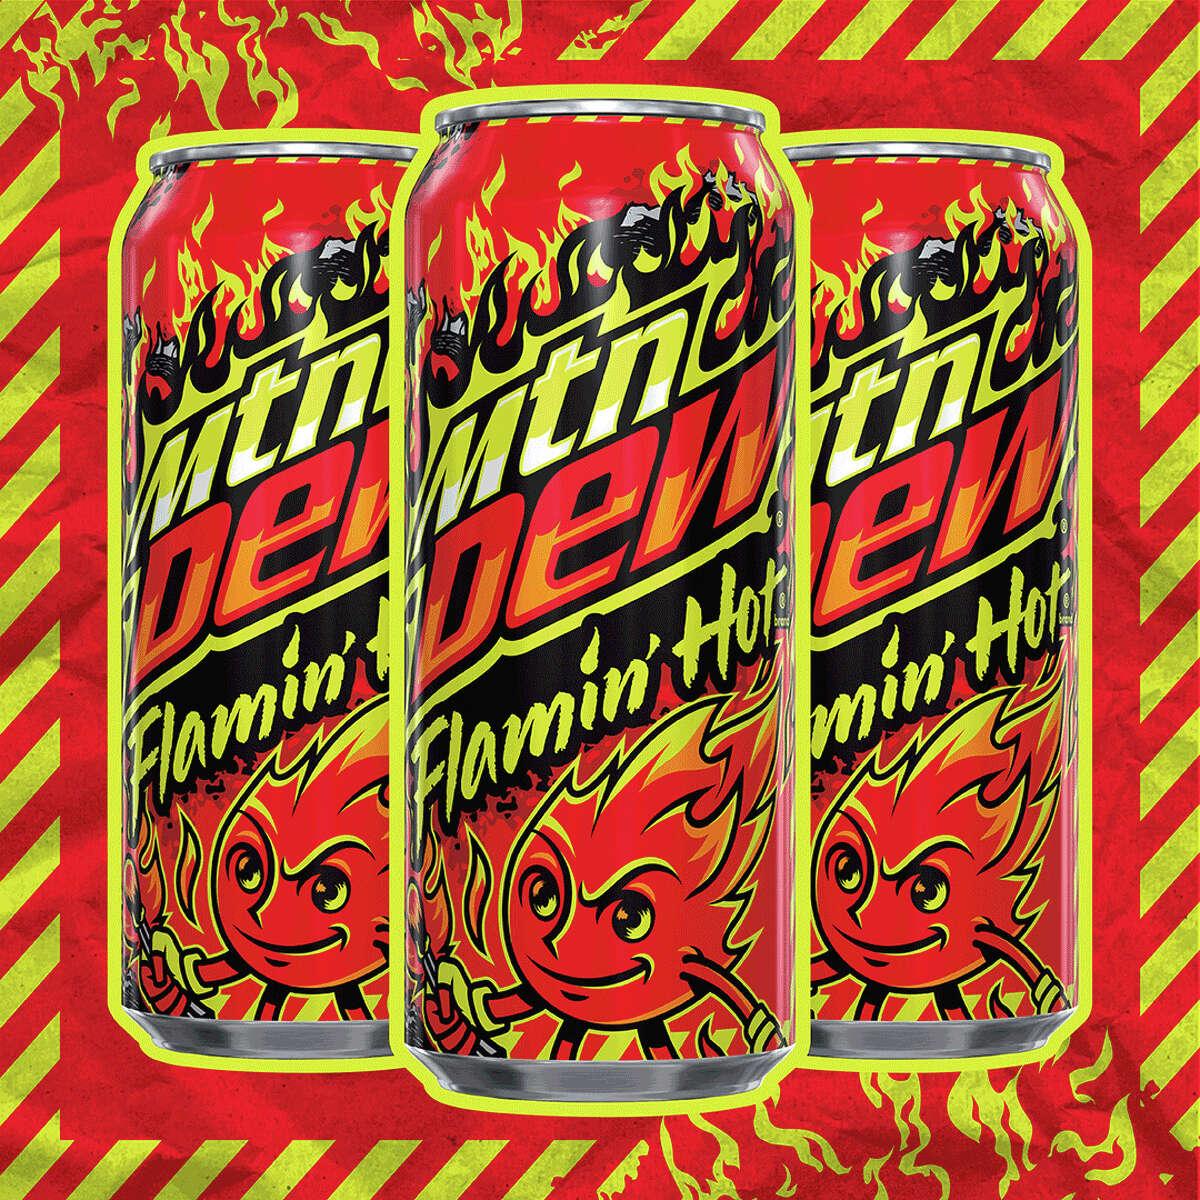 Flamin' Hot Mountain Dew (Credit: PepsiCo)